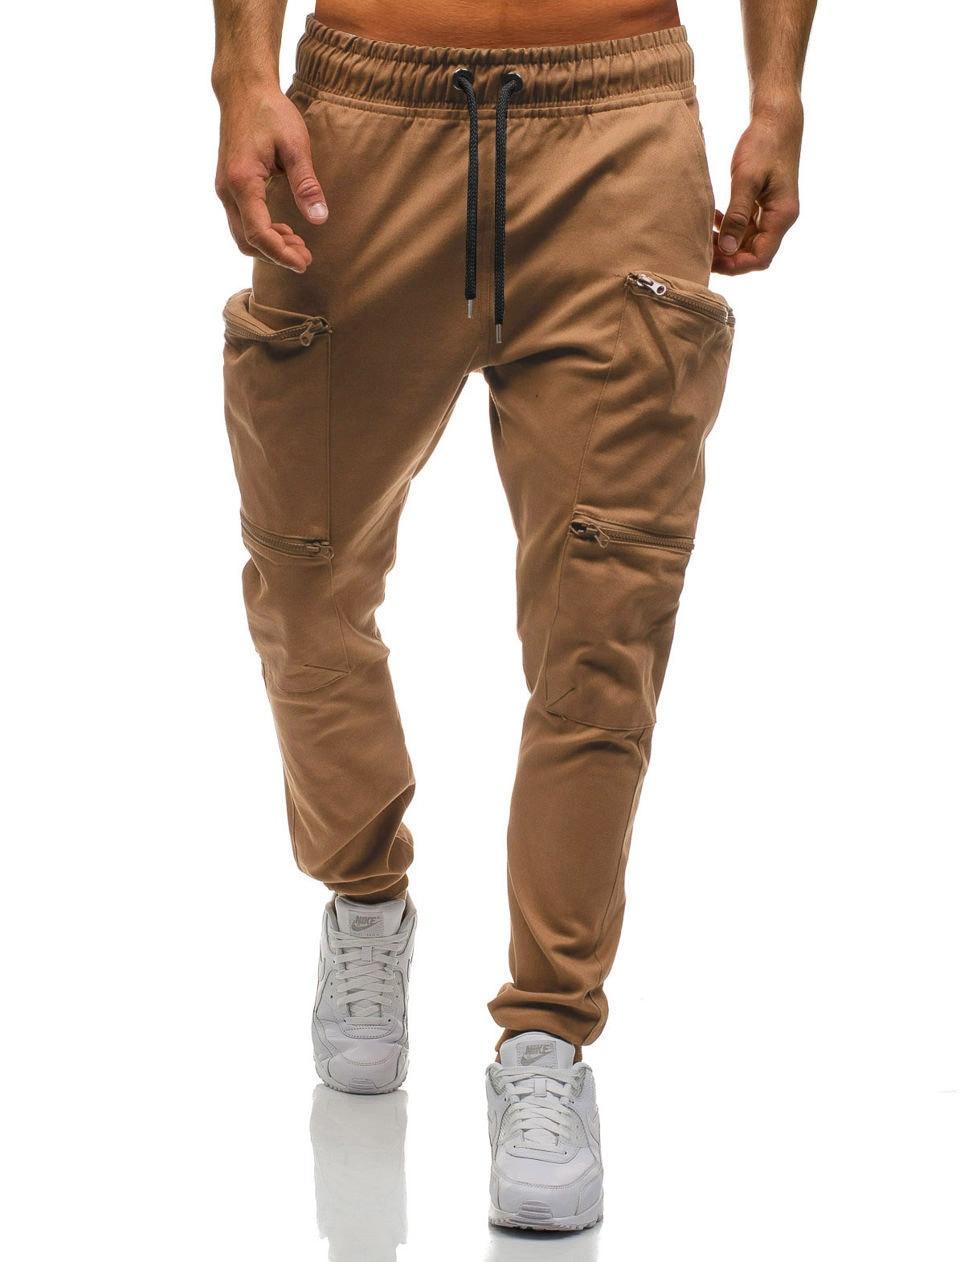 HTB1 1zqL7voK1RjSZFwq6AiCFXaB Mens Joggers 2019 New Red Camouflage Multi-Pockets Cargo Pants Men Cotton Harem Pants Hip Hop Trousers Streetwear XXXL